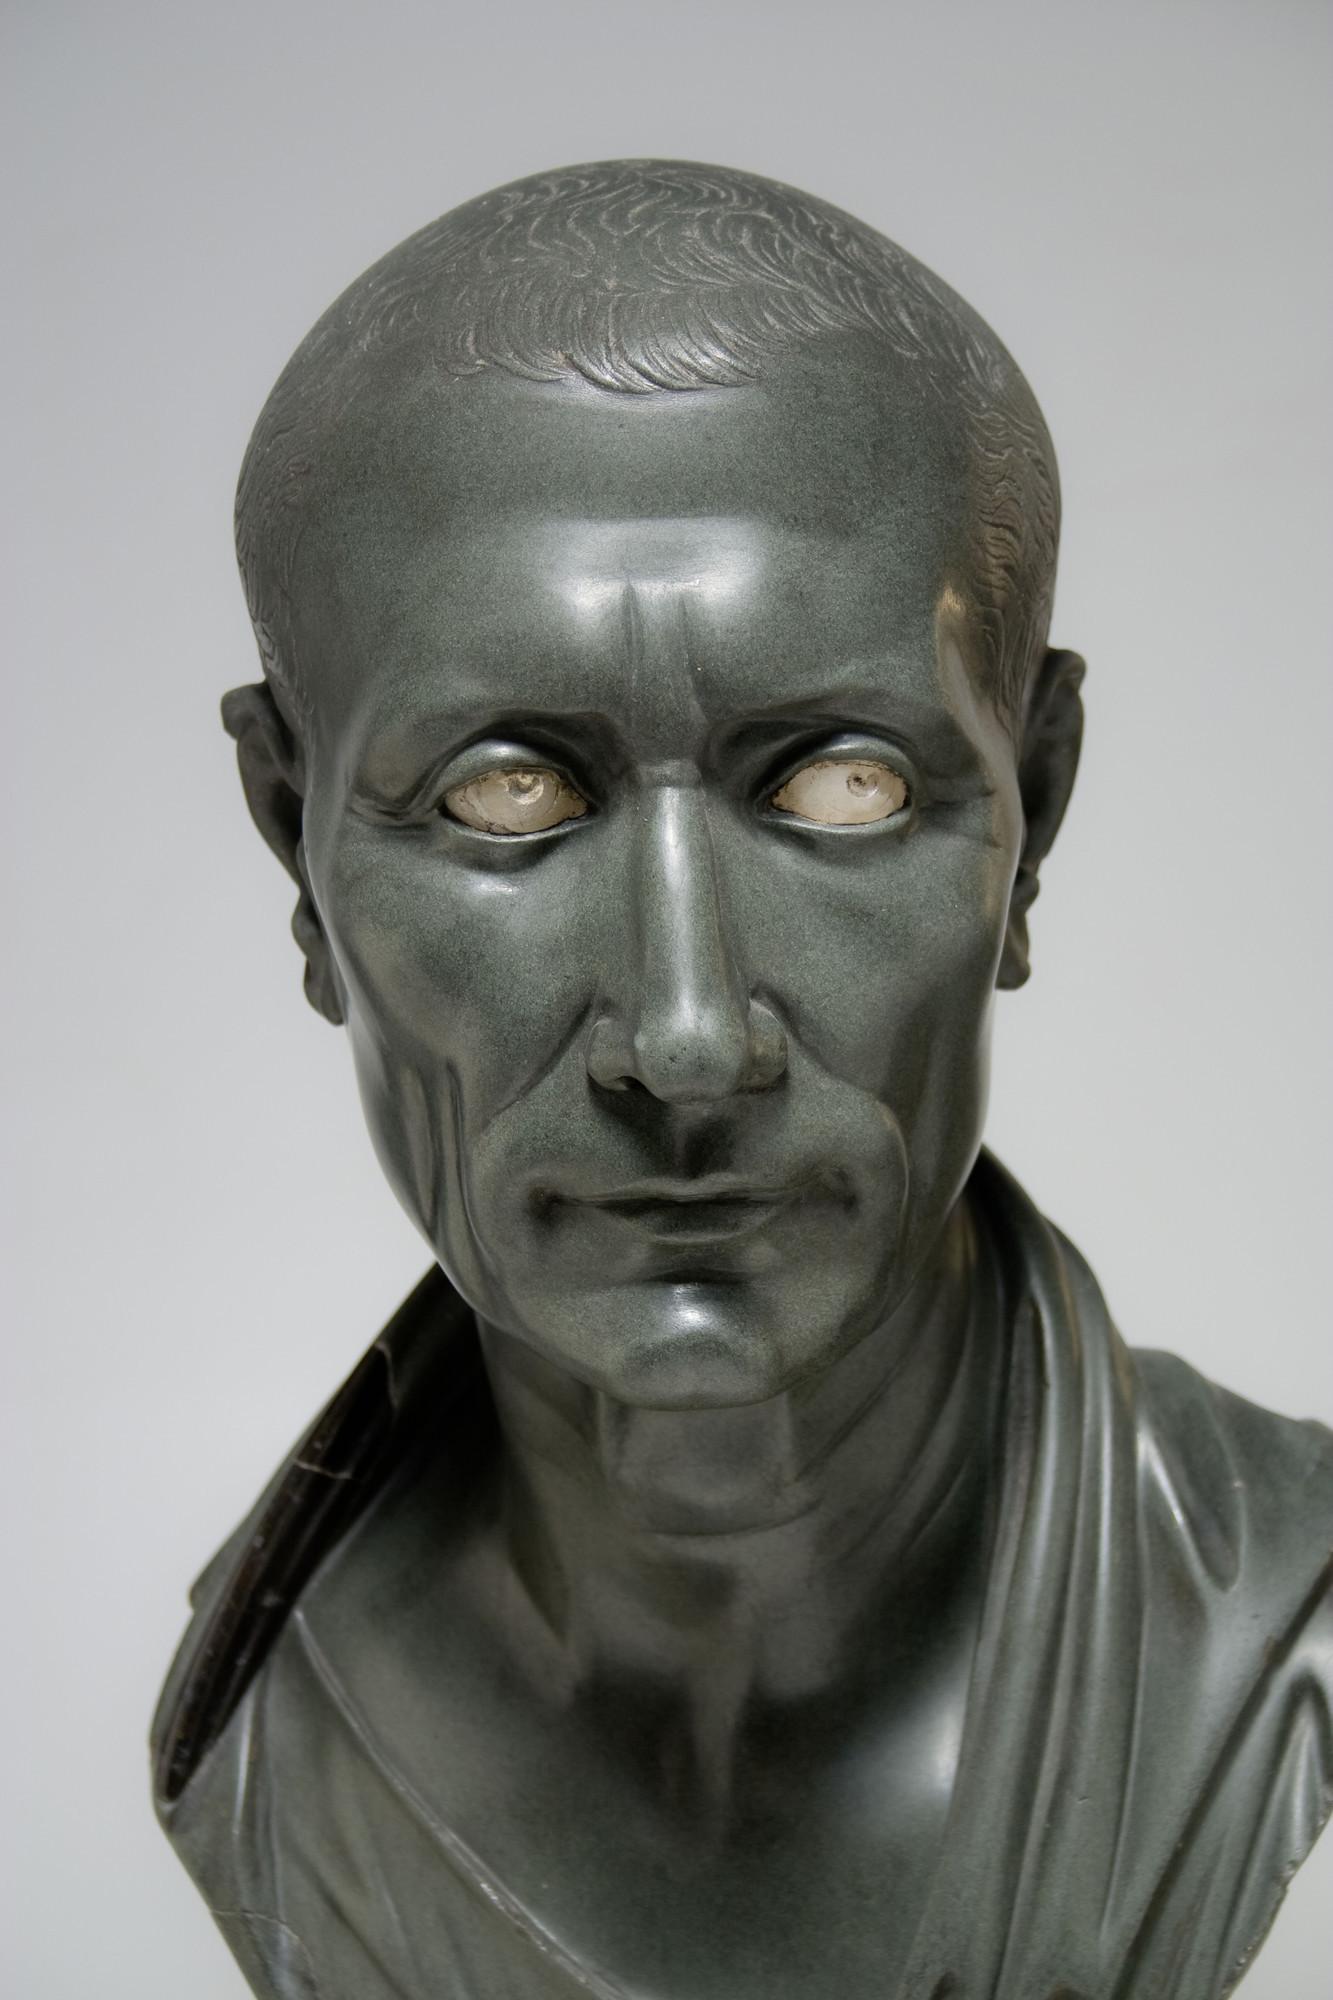 The Green Caesar